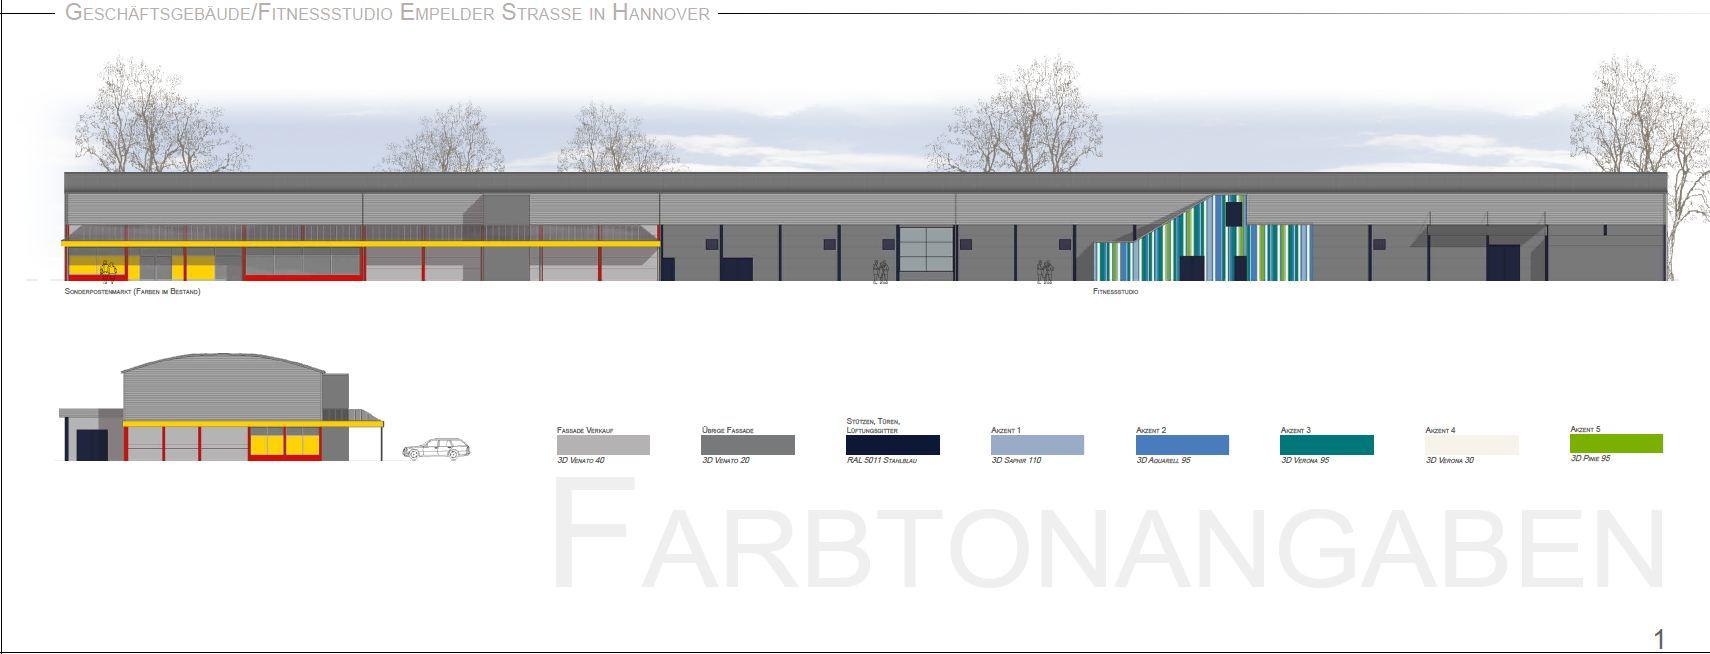 Fassadenentwurf, Malerarbeiten, Metallbeschichtung, Hannover, Maler, http://www.maler-heyse.de